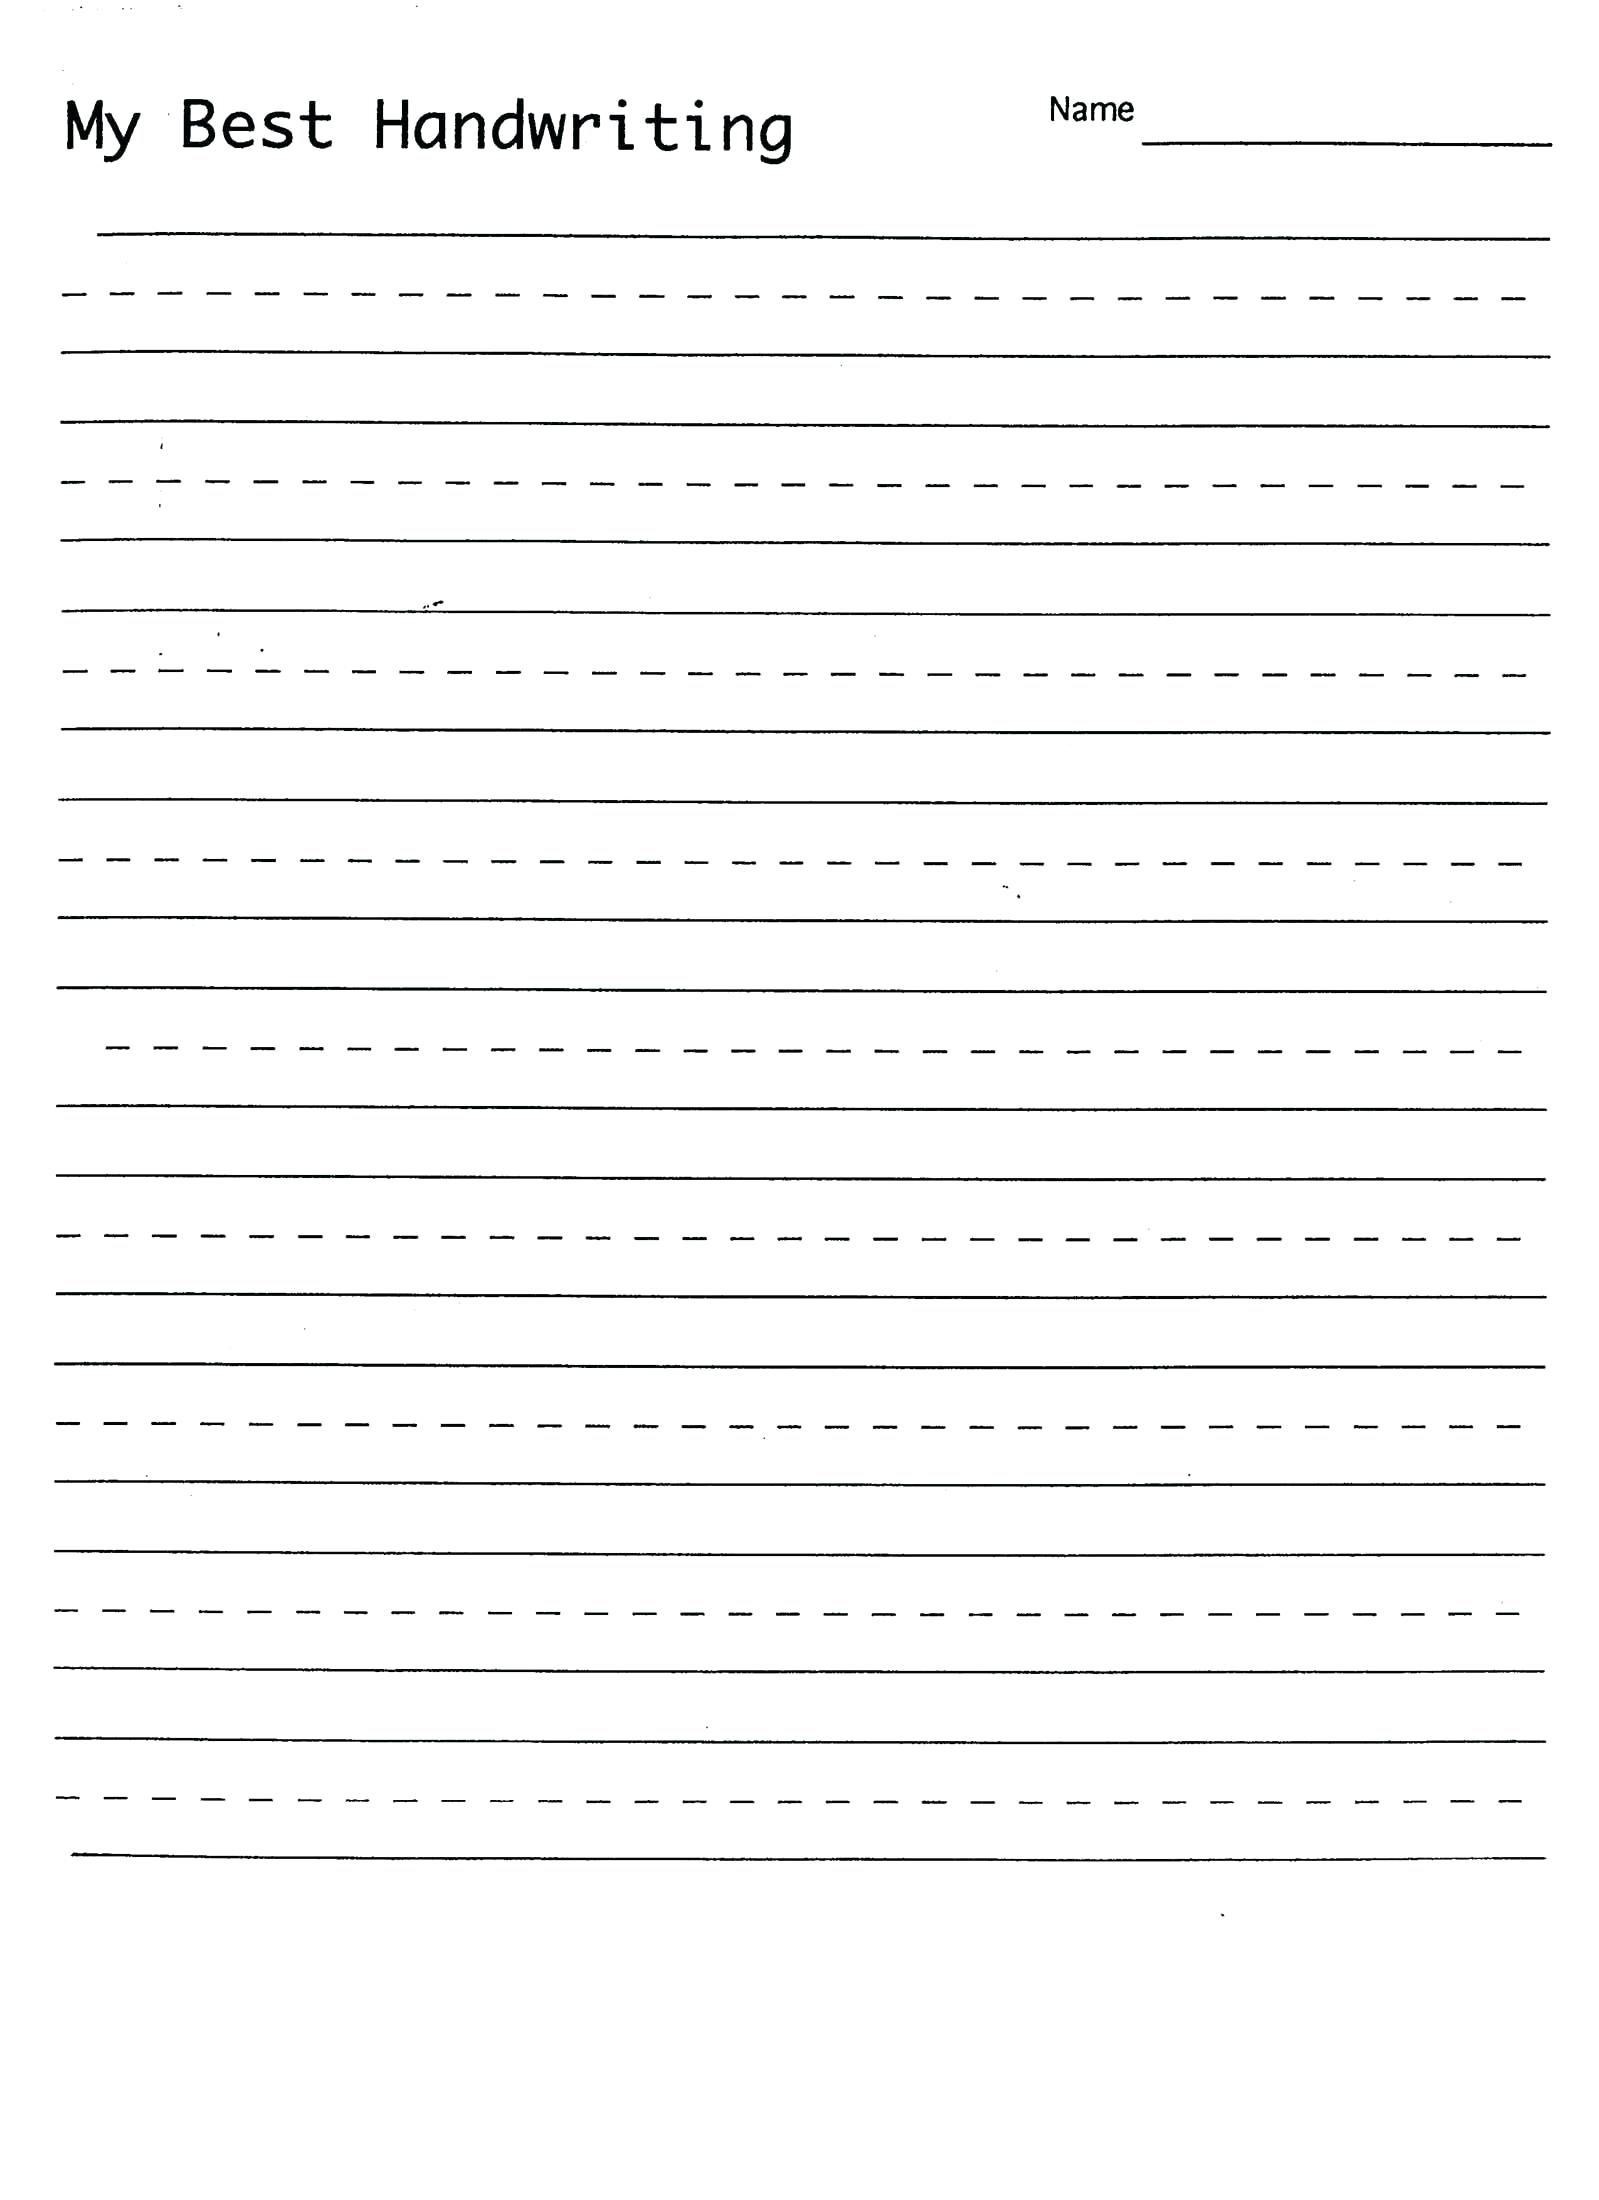 Free Cursive Sheets Free Printable Cursive Handwriting Worksheets - Free Printable Practice Name Writing Sheets